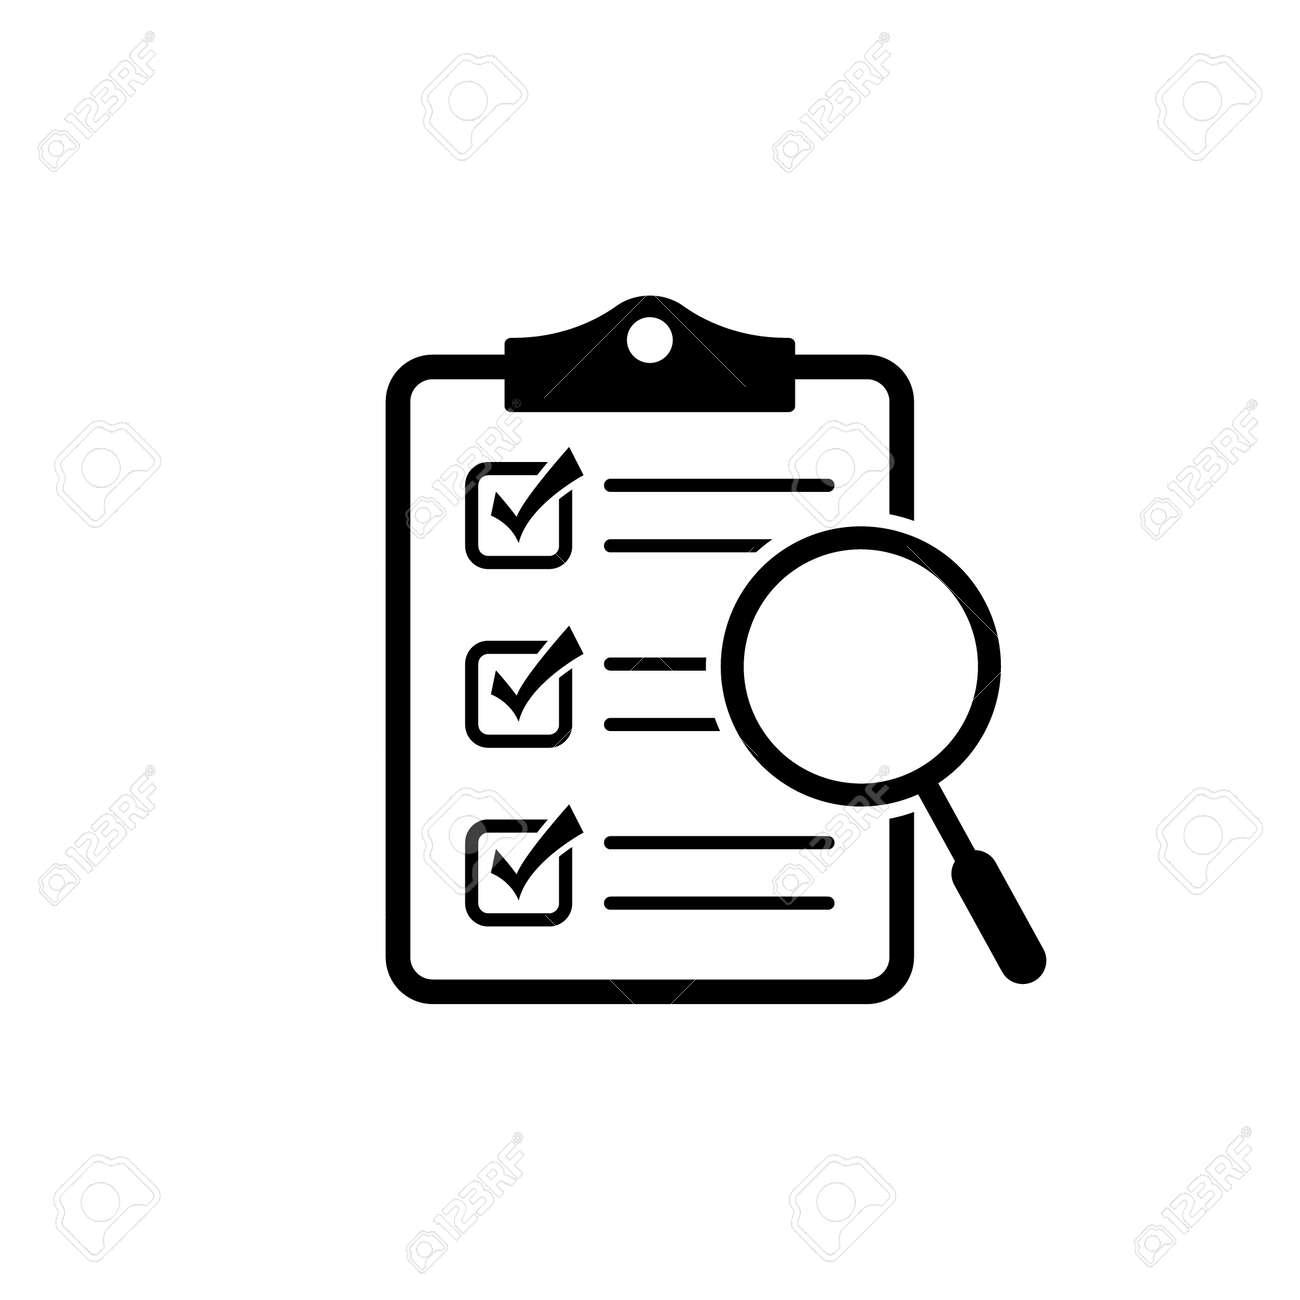 Magnifier assessment checklist icon - 157063222